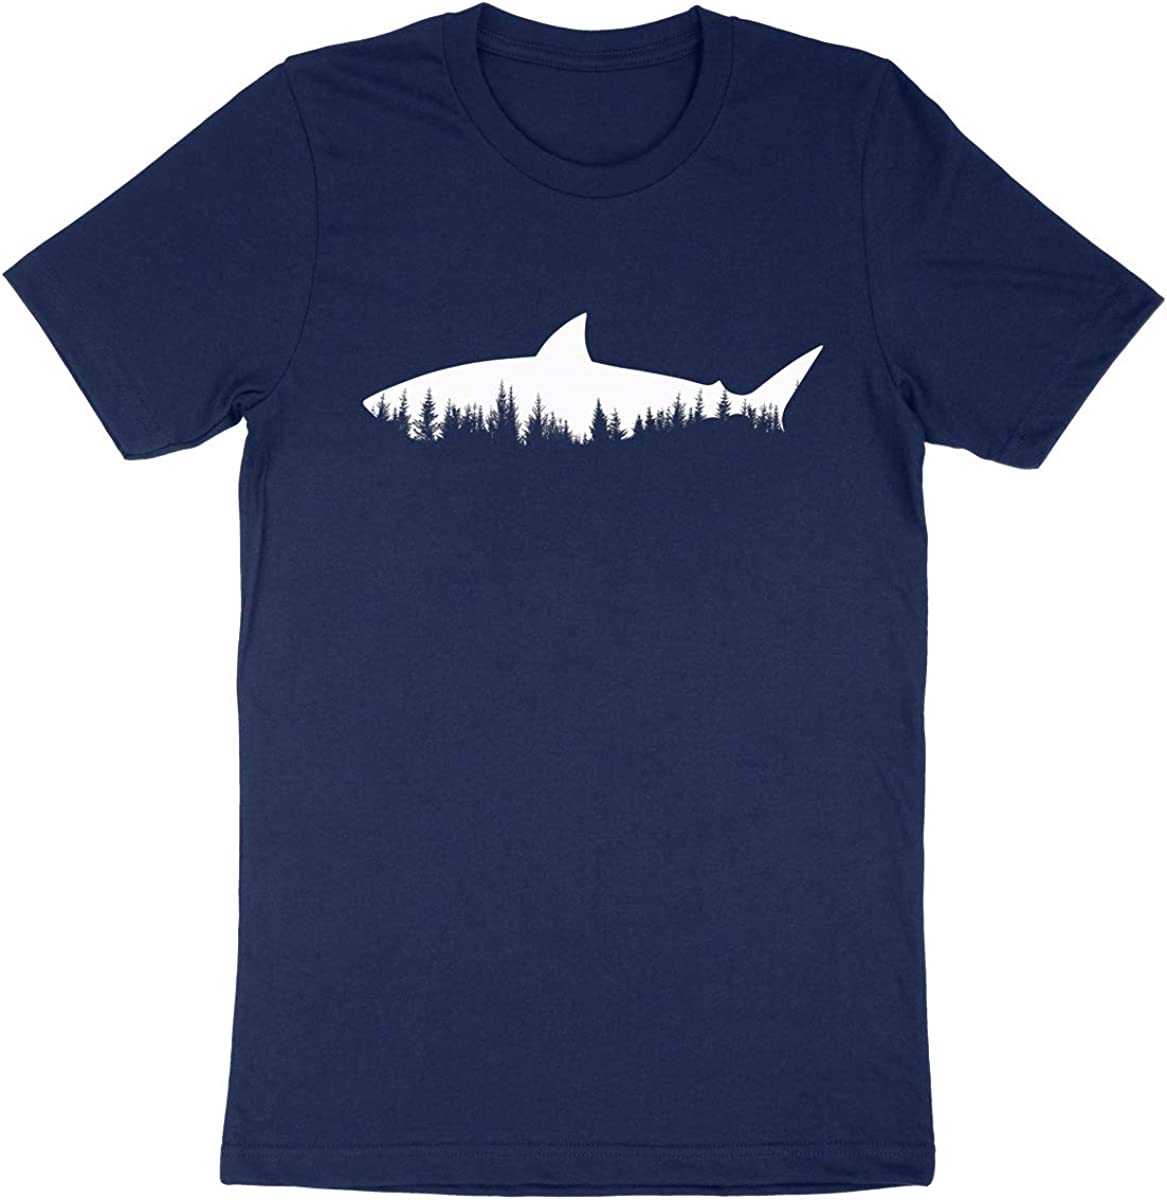 Shark x Forest T-Shirt Mens Graphic Design Shirts